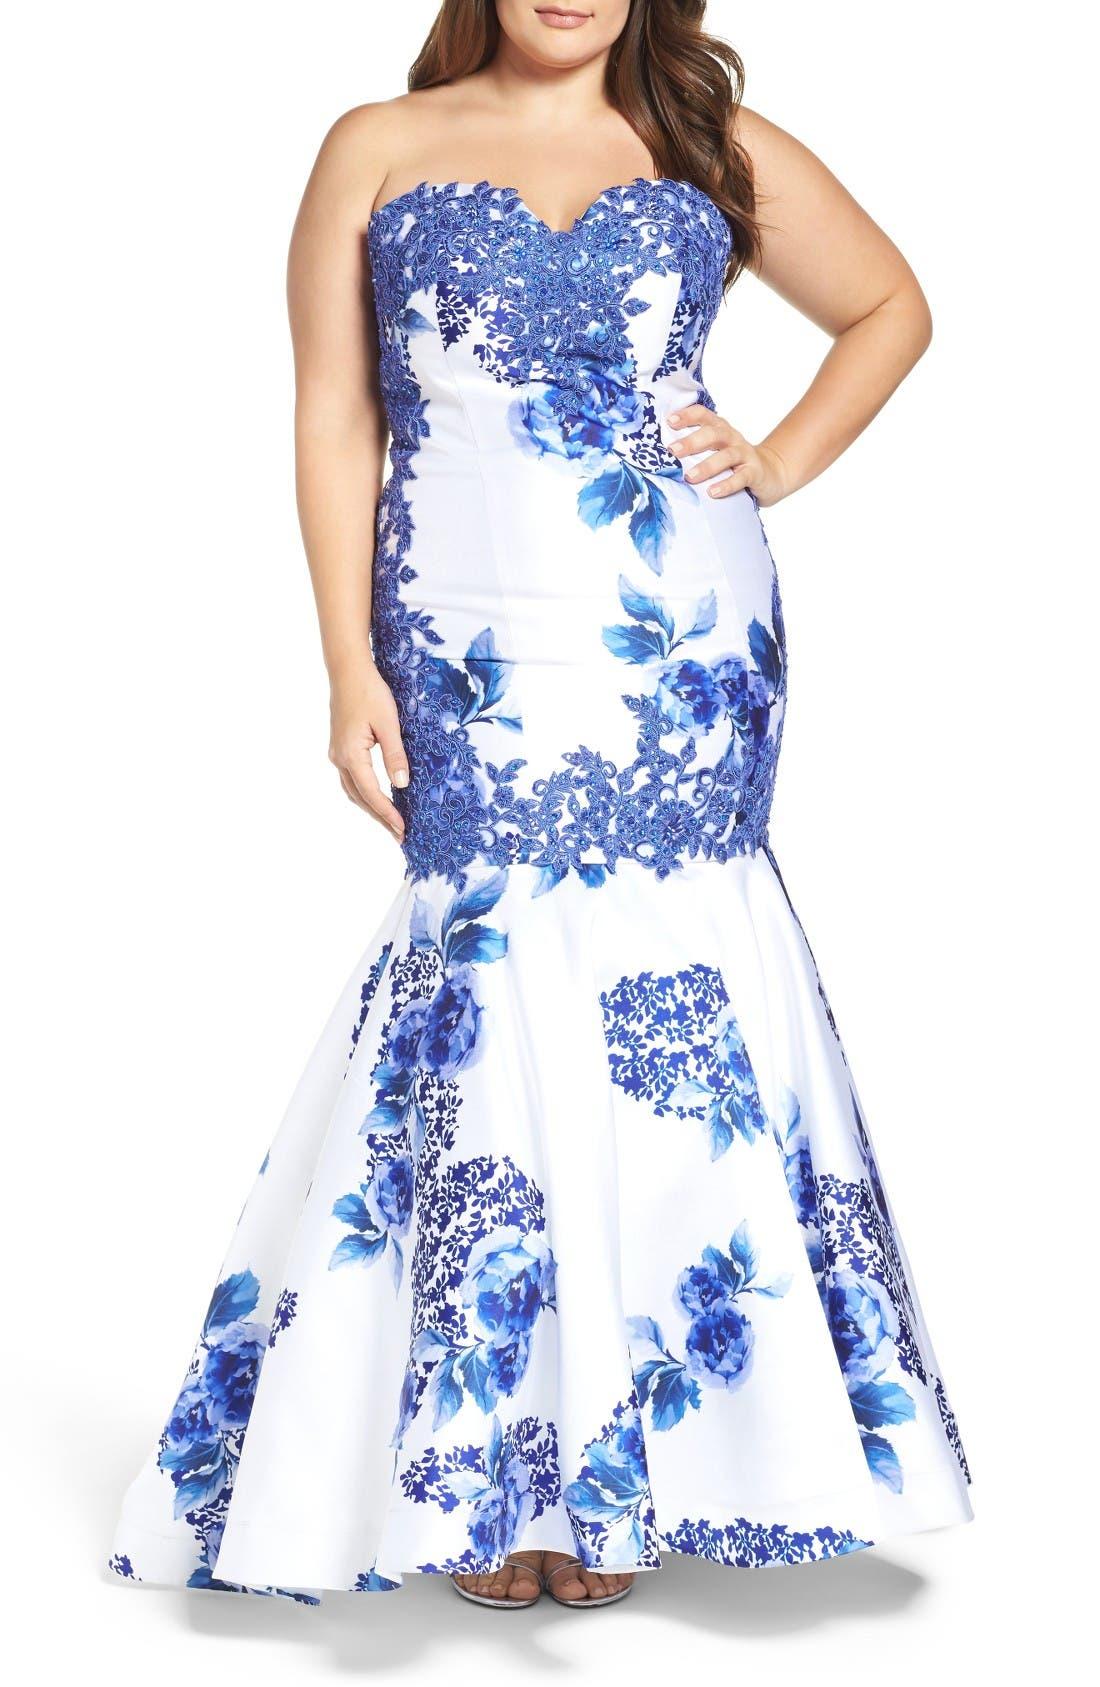 Alternate Image 1 Selected - Mac Duggal Embellished Strapless Zip Off Mermaid Gown (Plus Size)